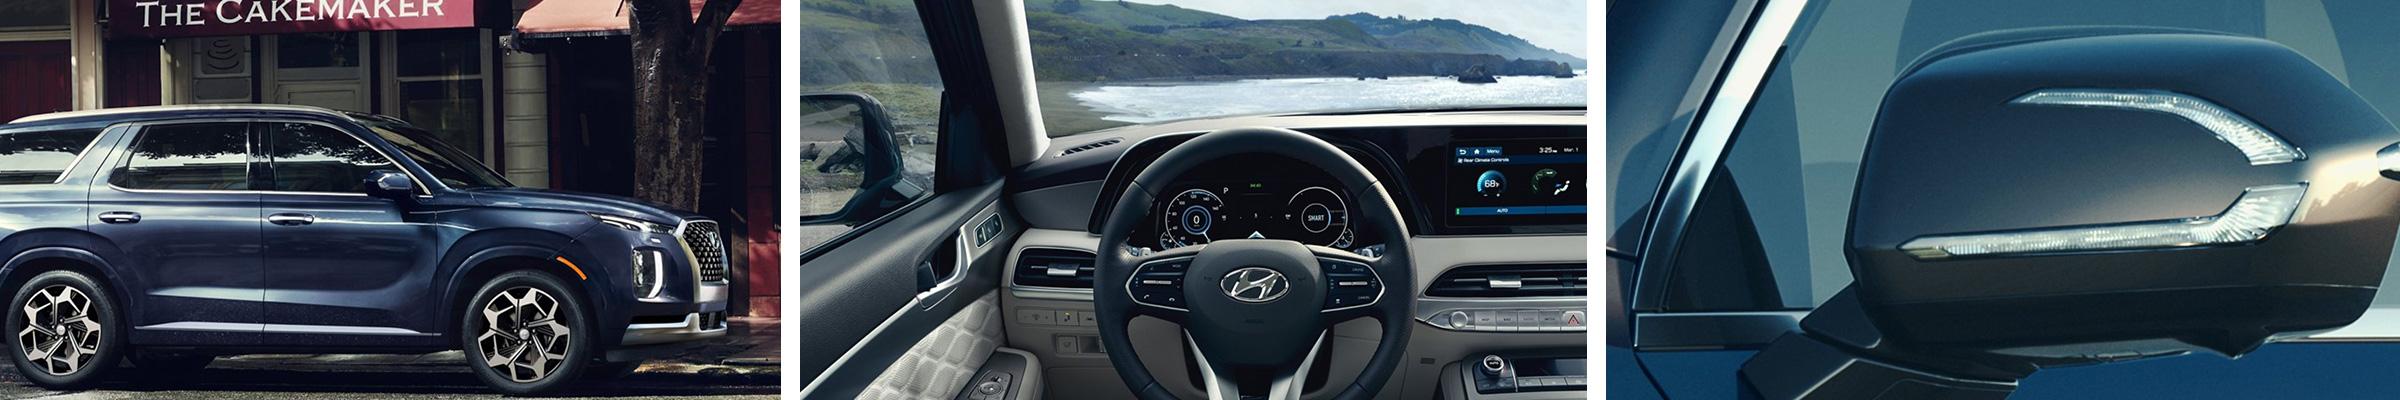 2021 Hyundai Palisade For Sale Dearborn MI | Detroit